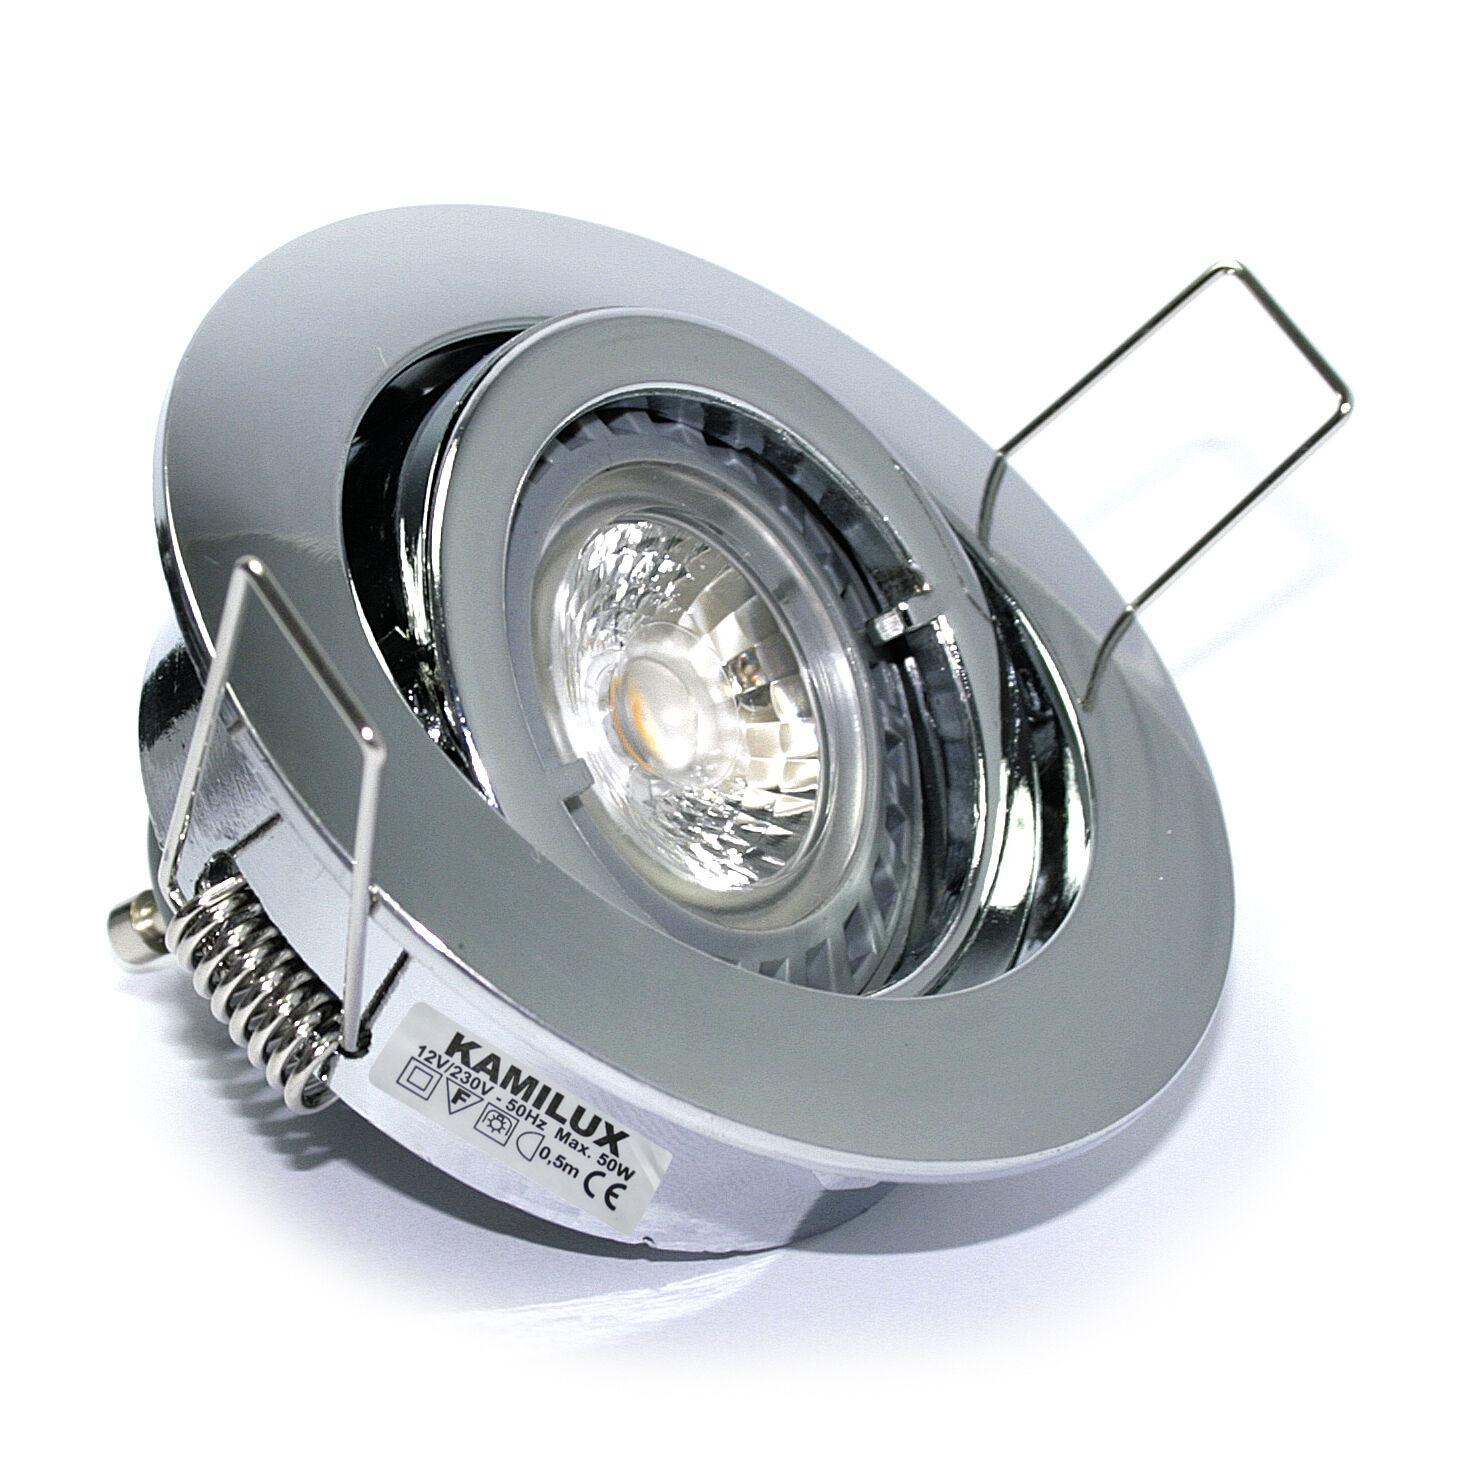 230V Hochvolt Einbaustrahler inkl. 7W  52W Power LED GU10 LM